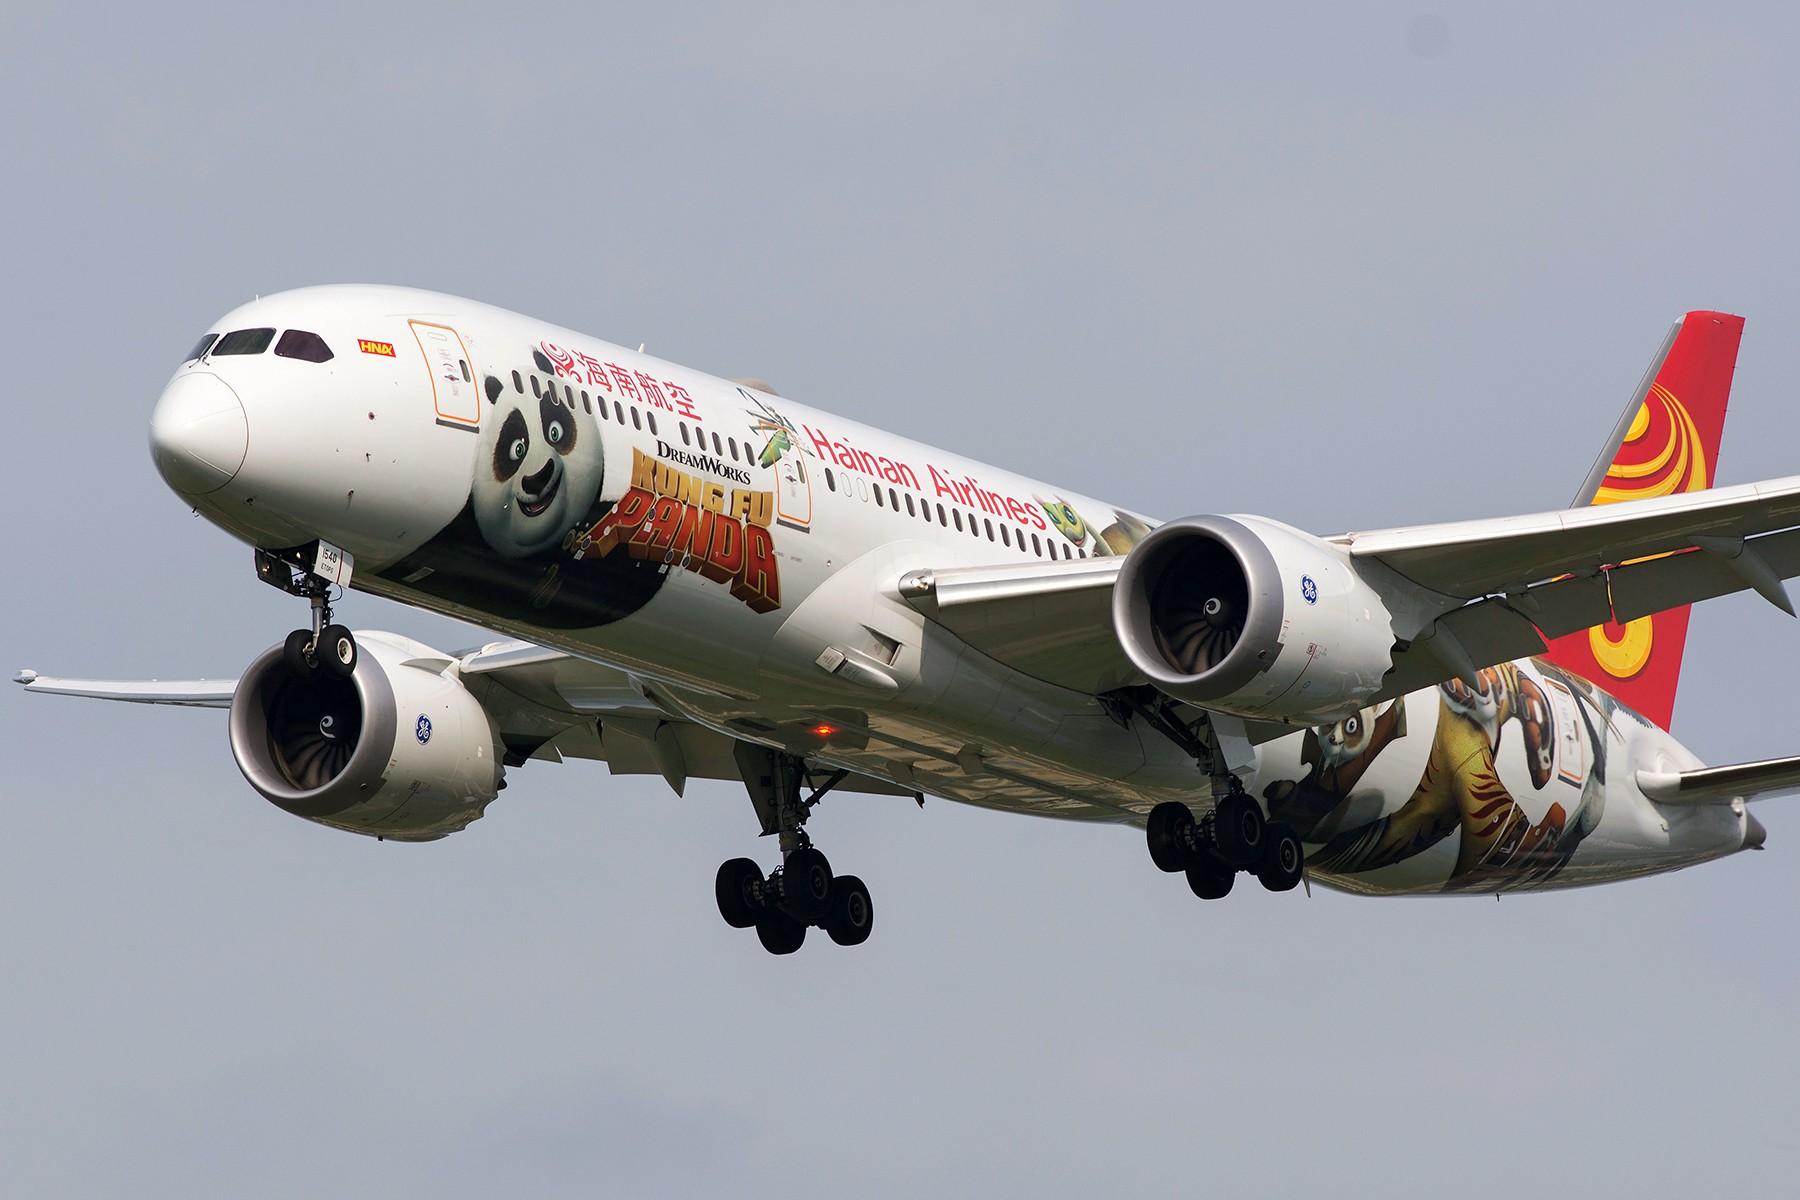 [PVG] 迎来送往白斩熊猫 BOEING 787-9 B-1540 中国上海浦东国际机场